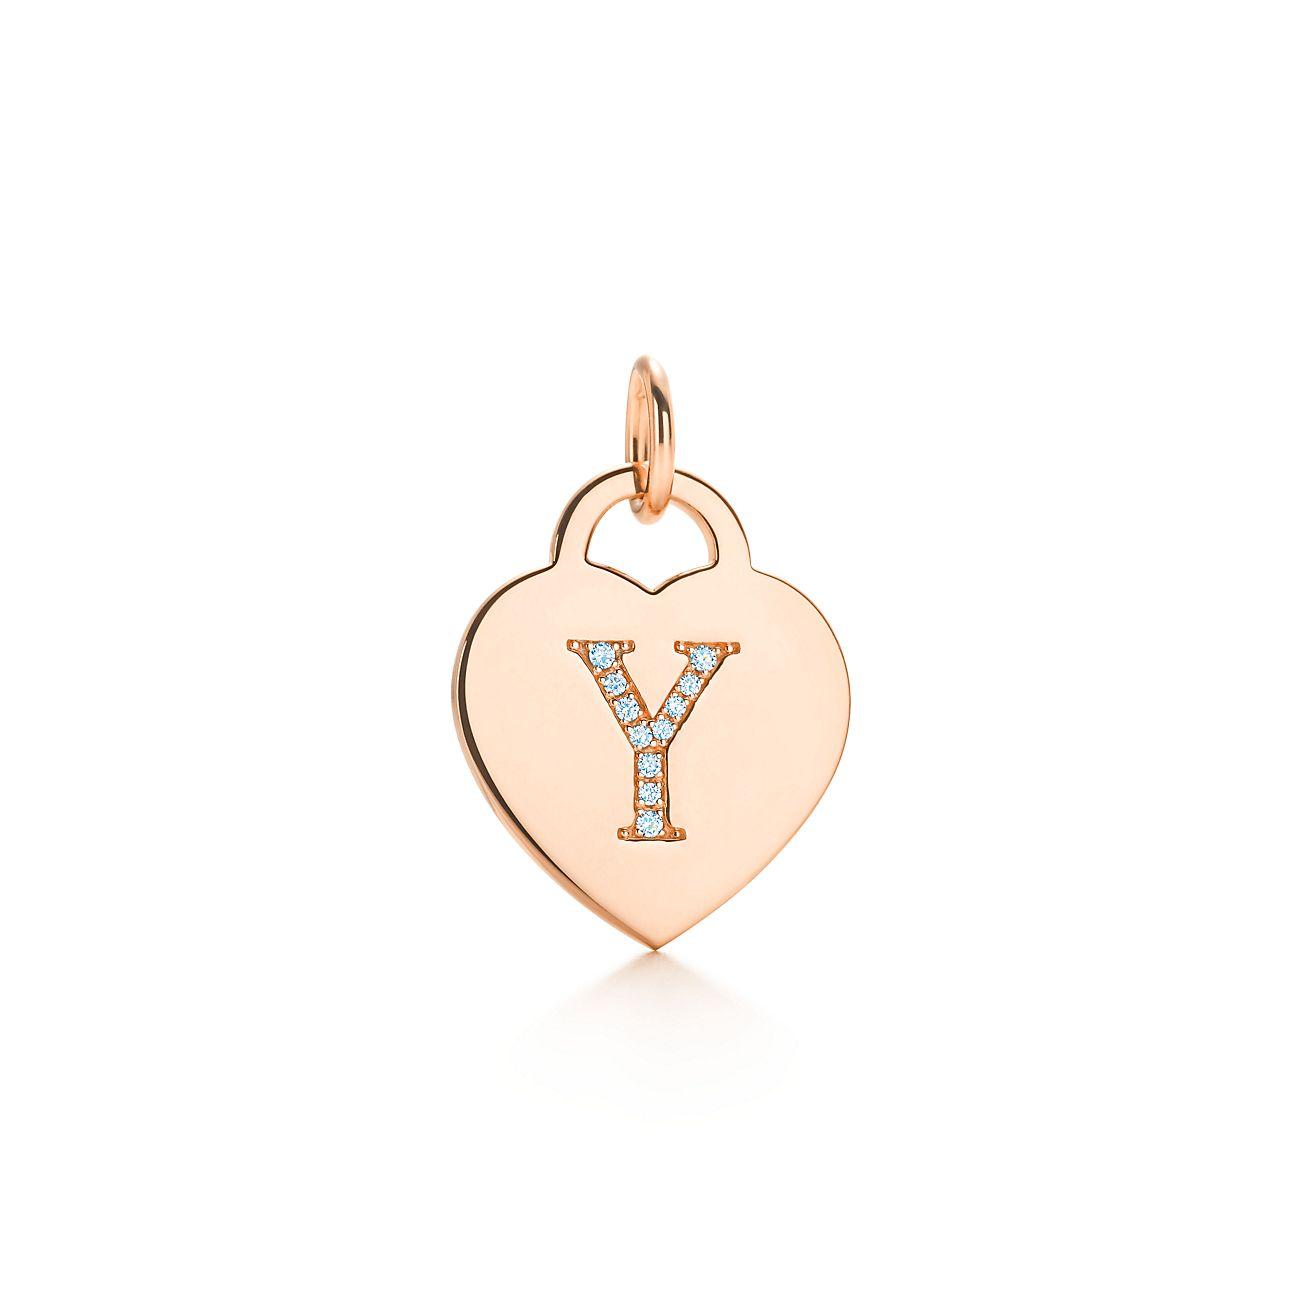 Charme Lettre Alphabet Tag Coeur M En Or Rose 18 Lettres D'or Az Disponible - Taille M Tiffany & Co. Bd2xBeg